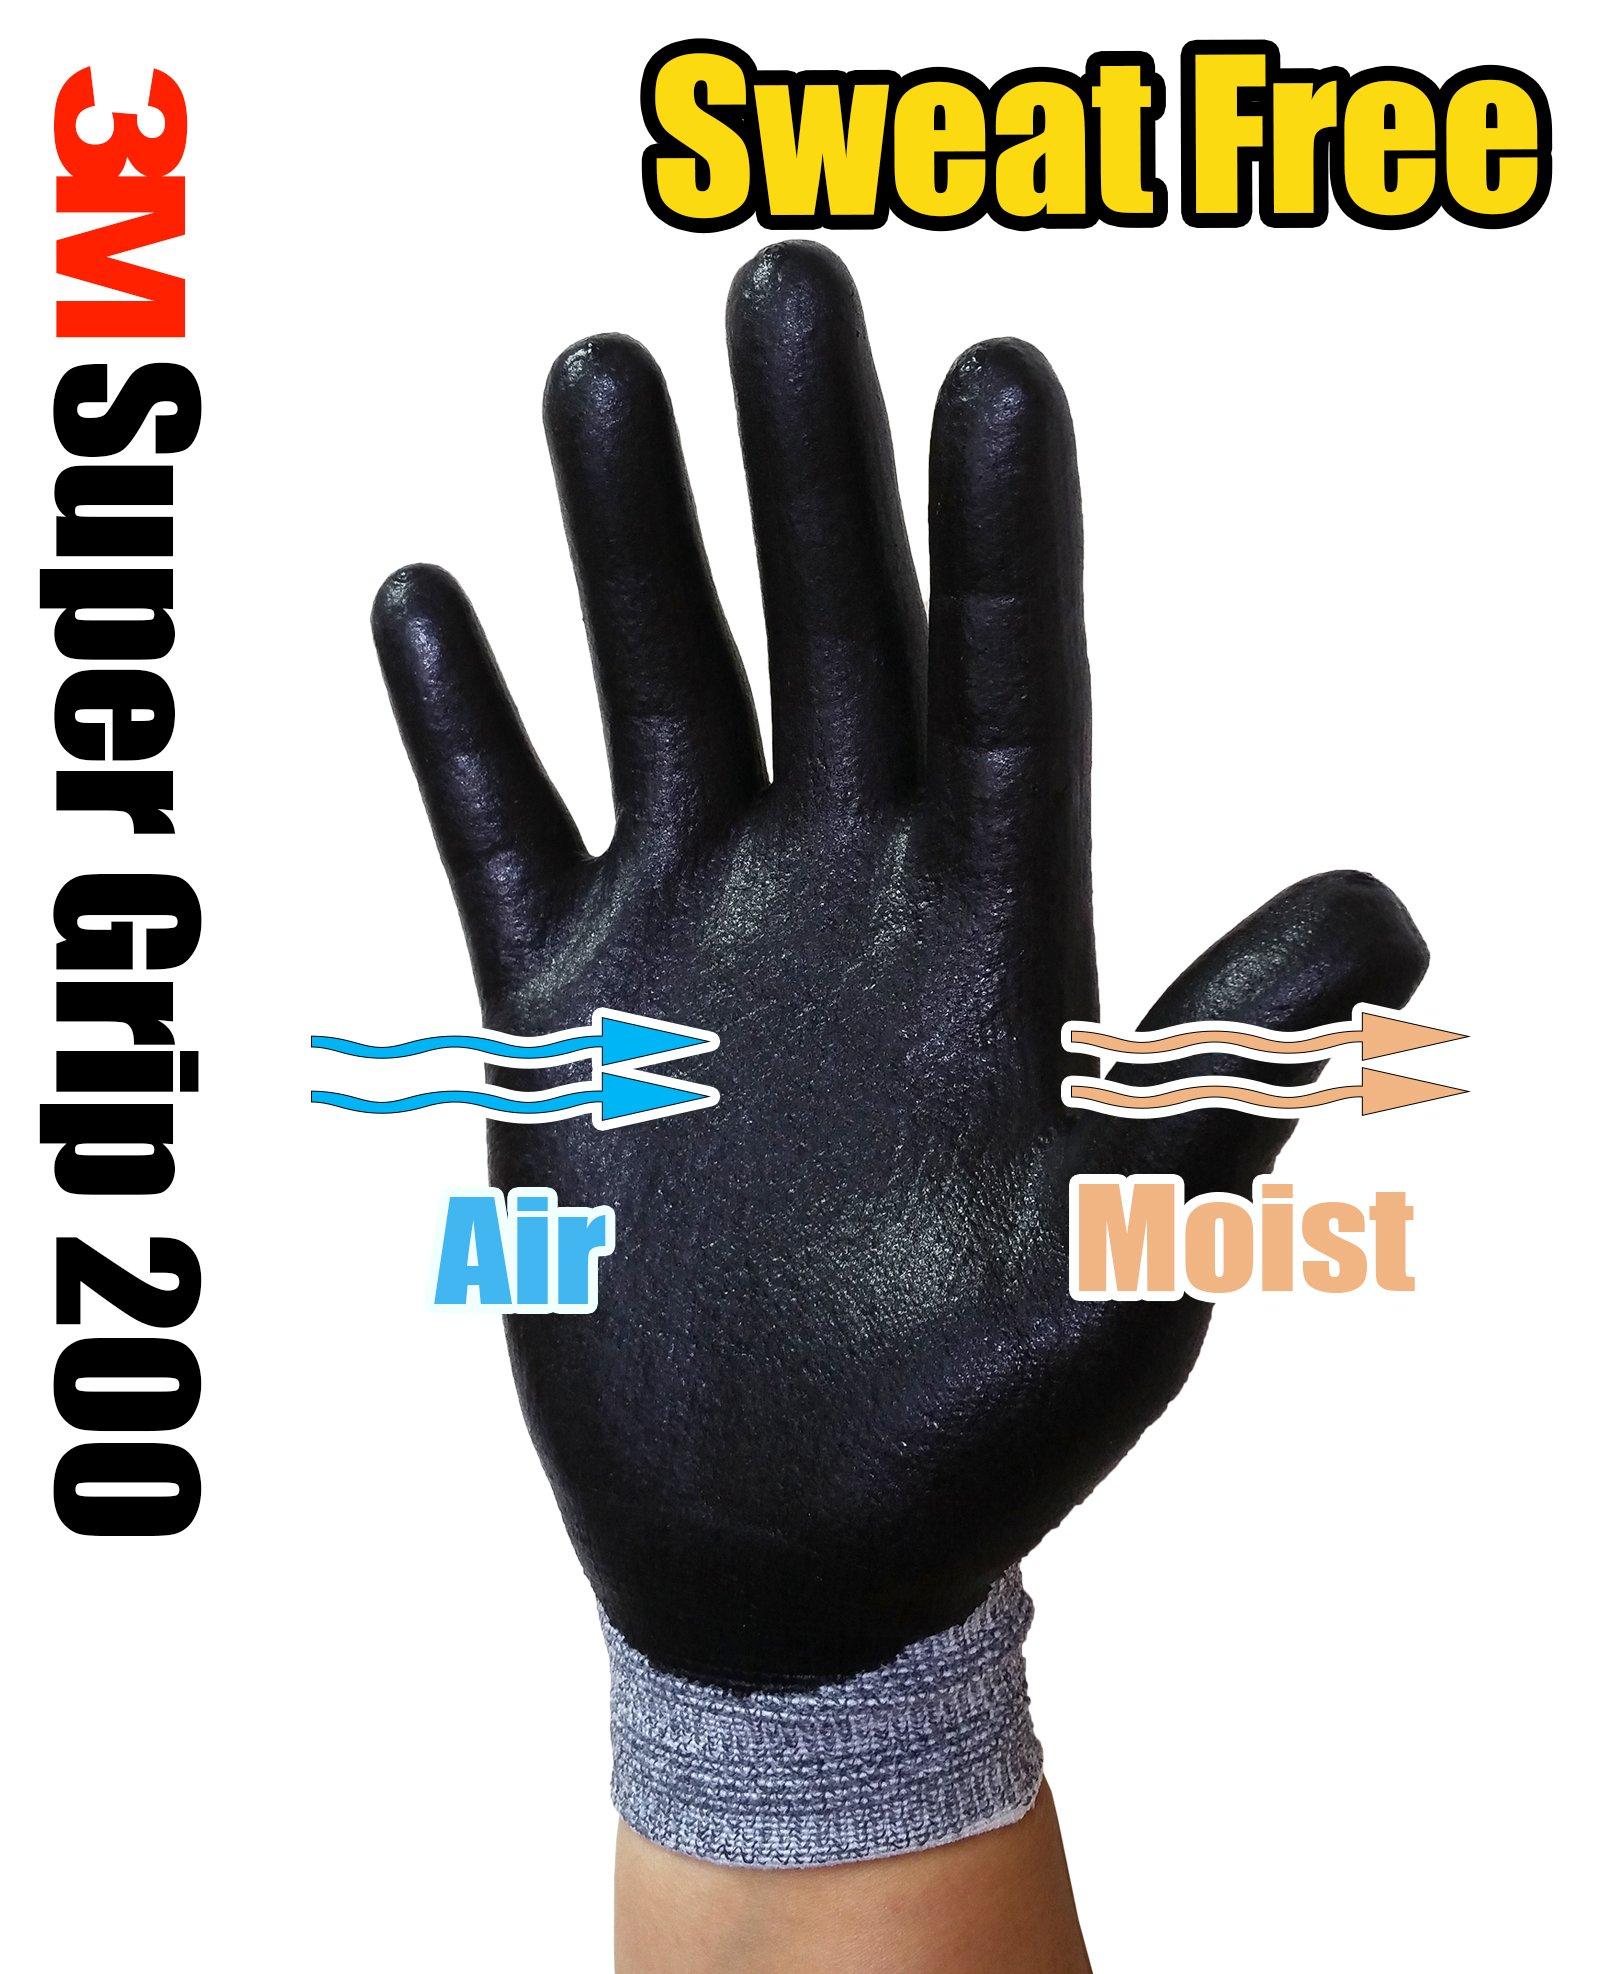 3M Super Grip Garden Work Gloves- 3 PACK (Extra Large) by 3M Super Grip (Image #6)